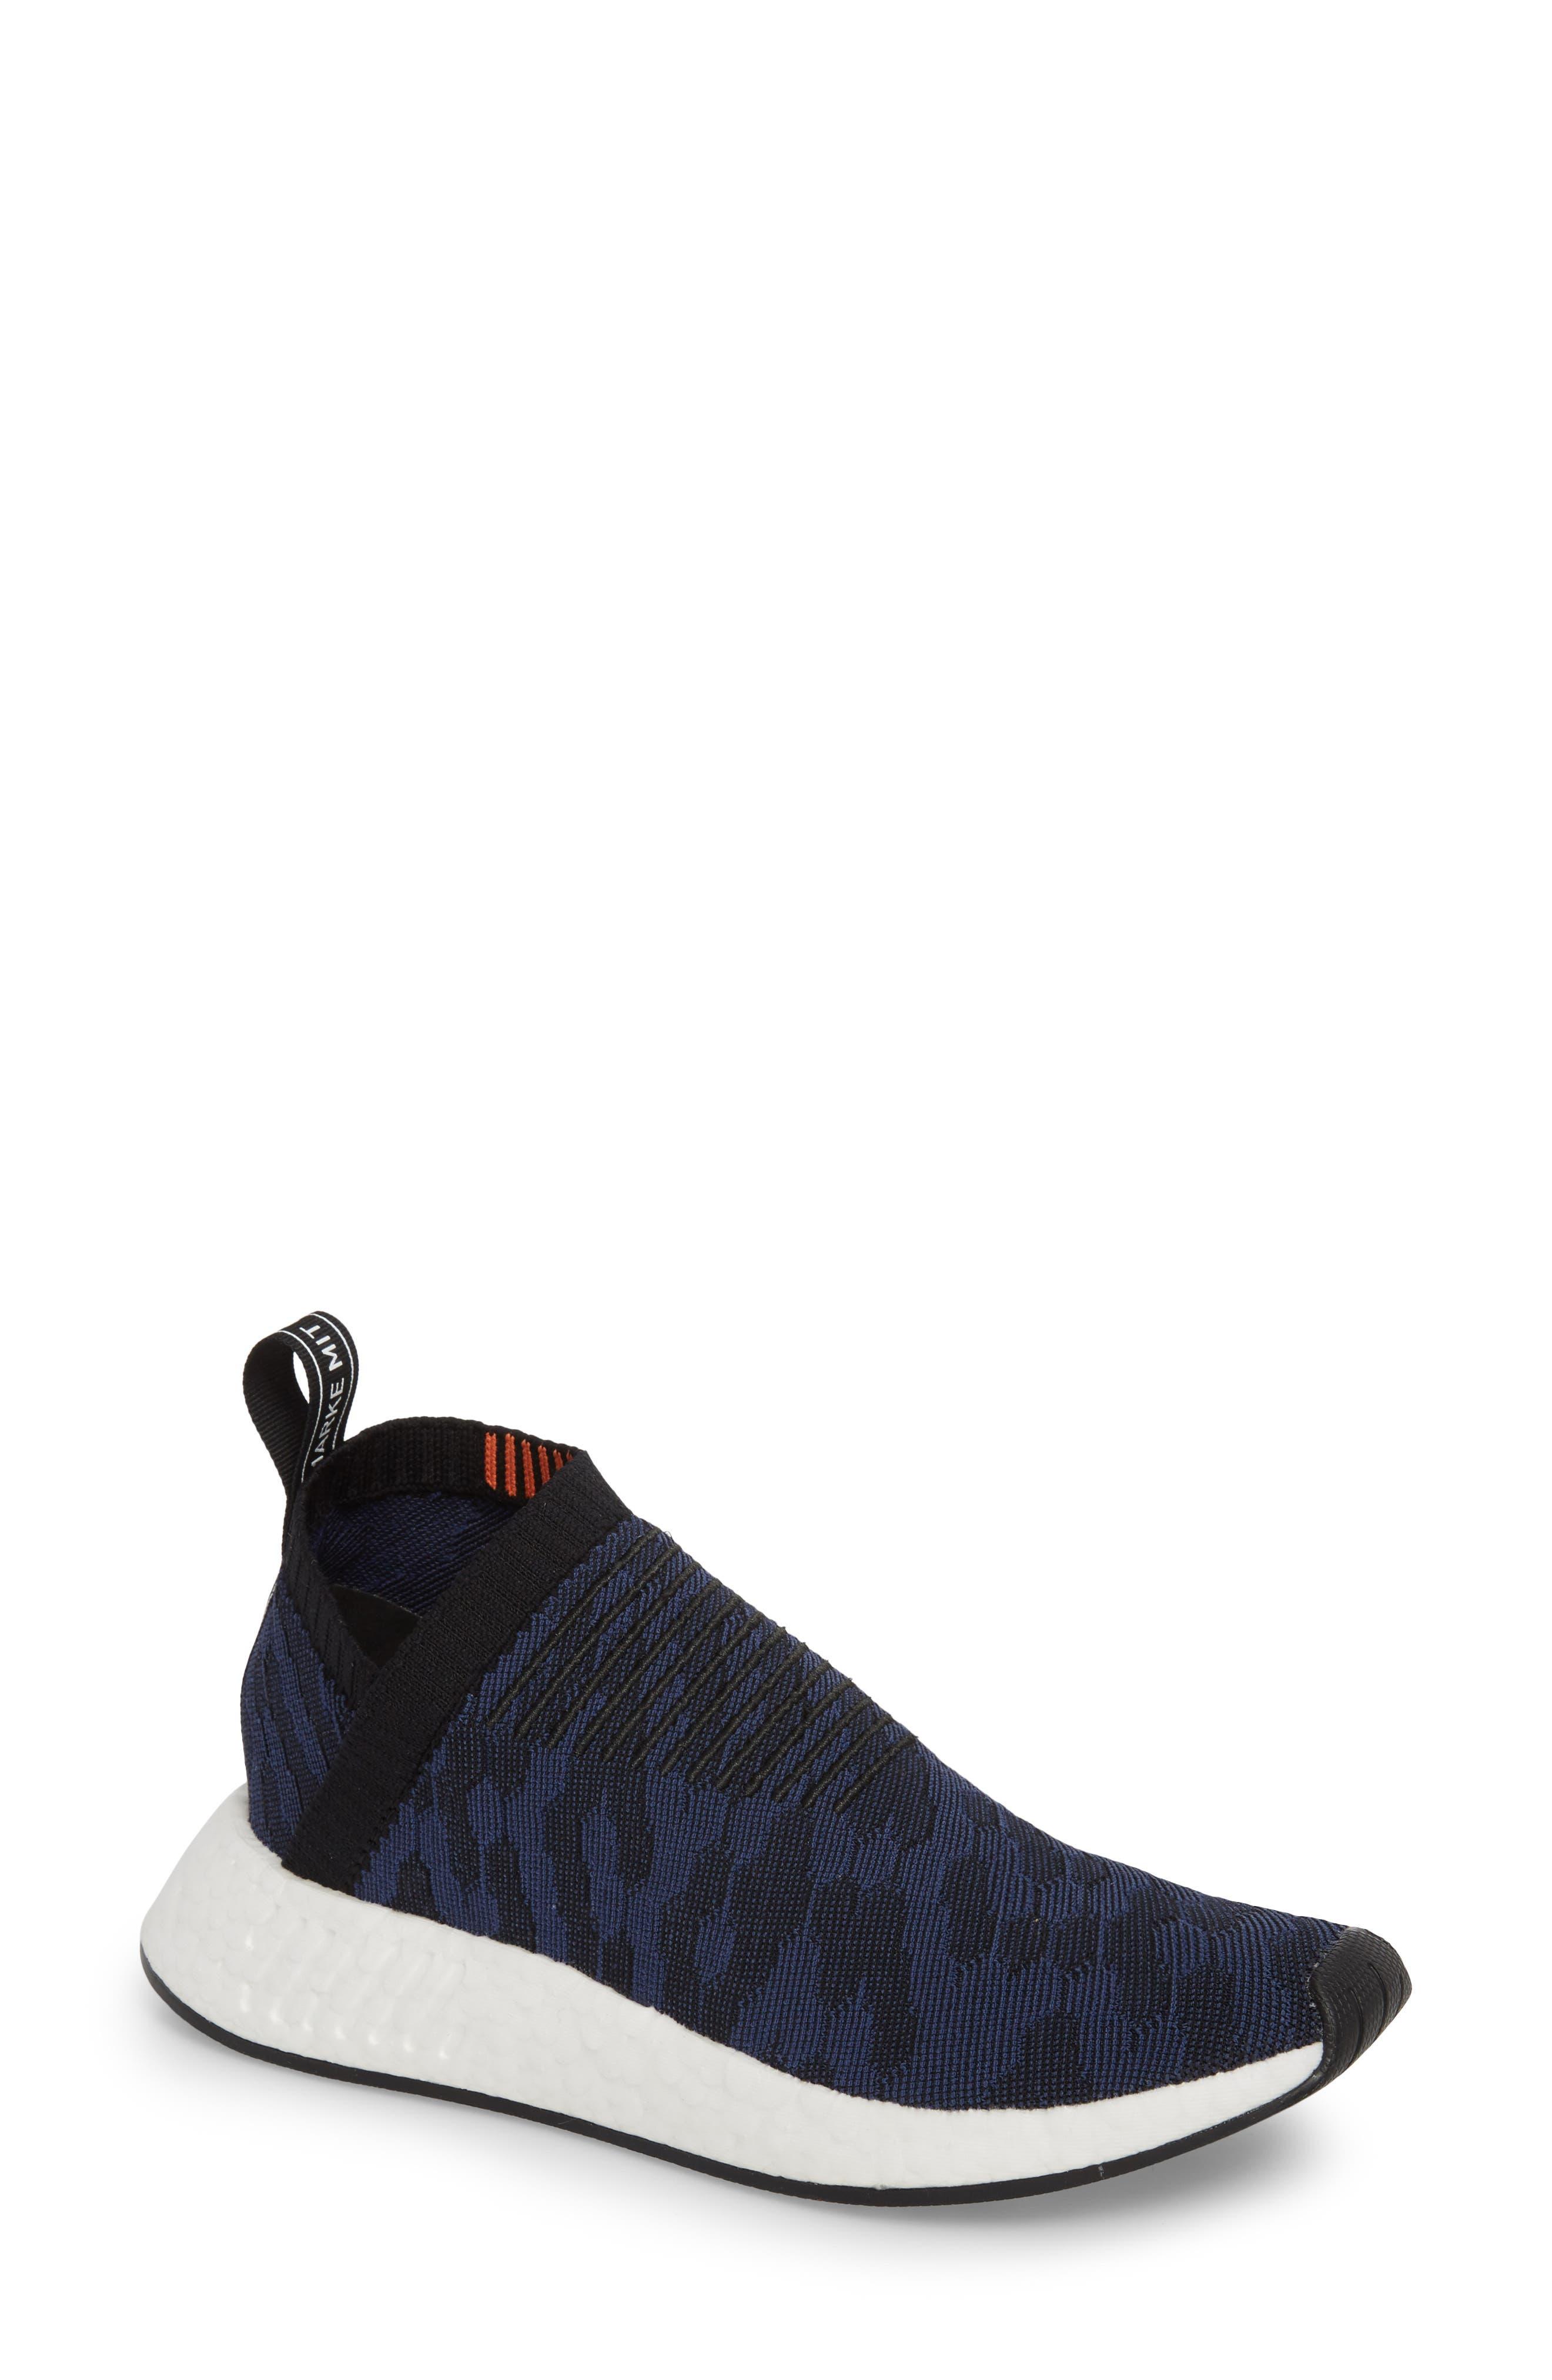 NMD CS2 Primeknit Sneaker,                         Main,                         color, Core Black/ Noble Indigo